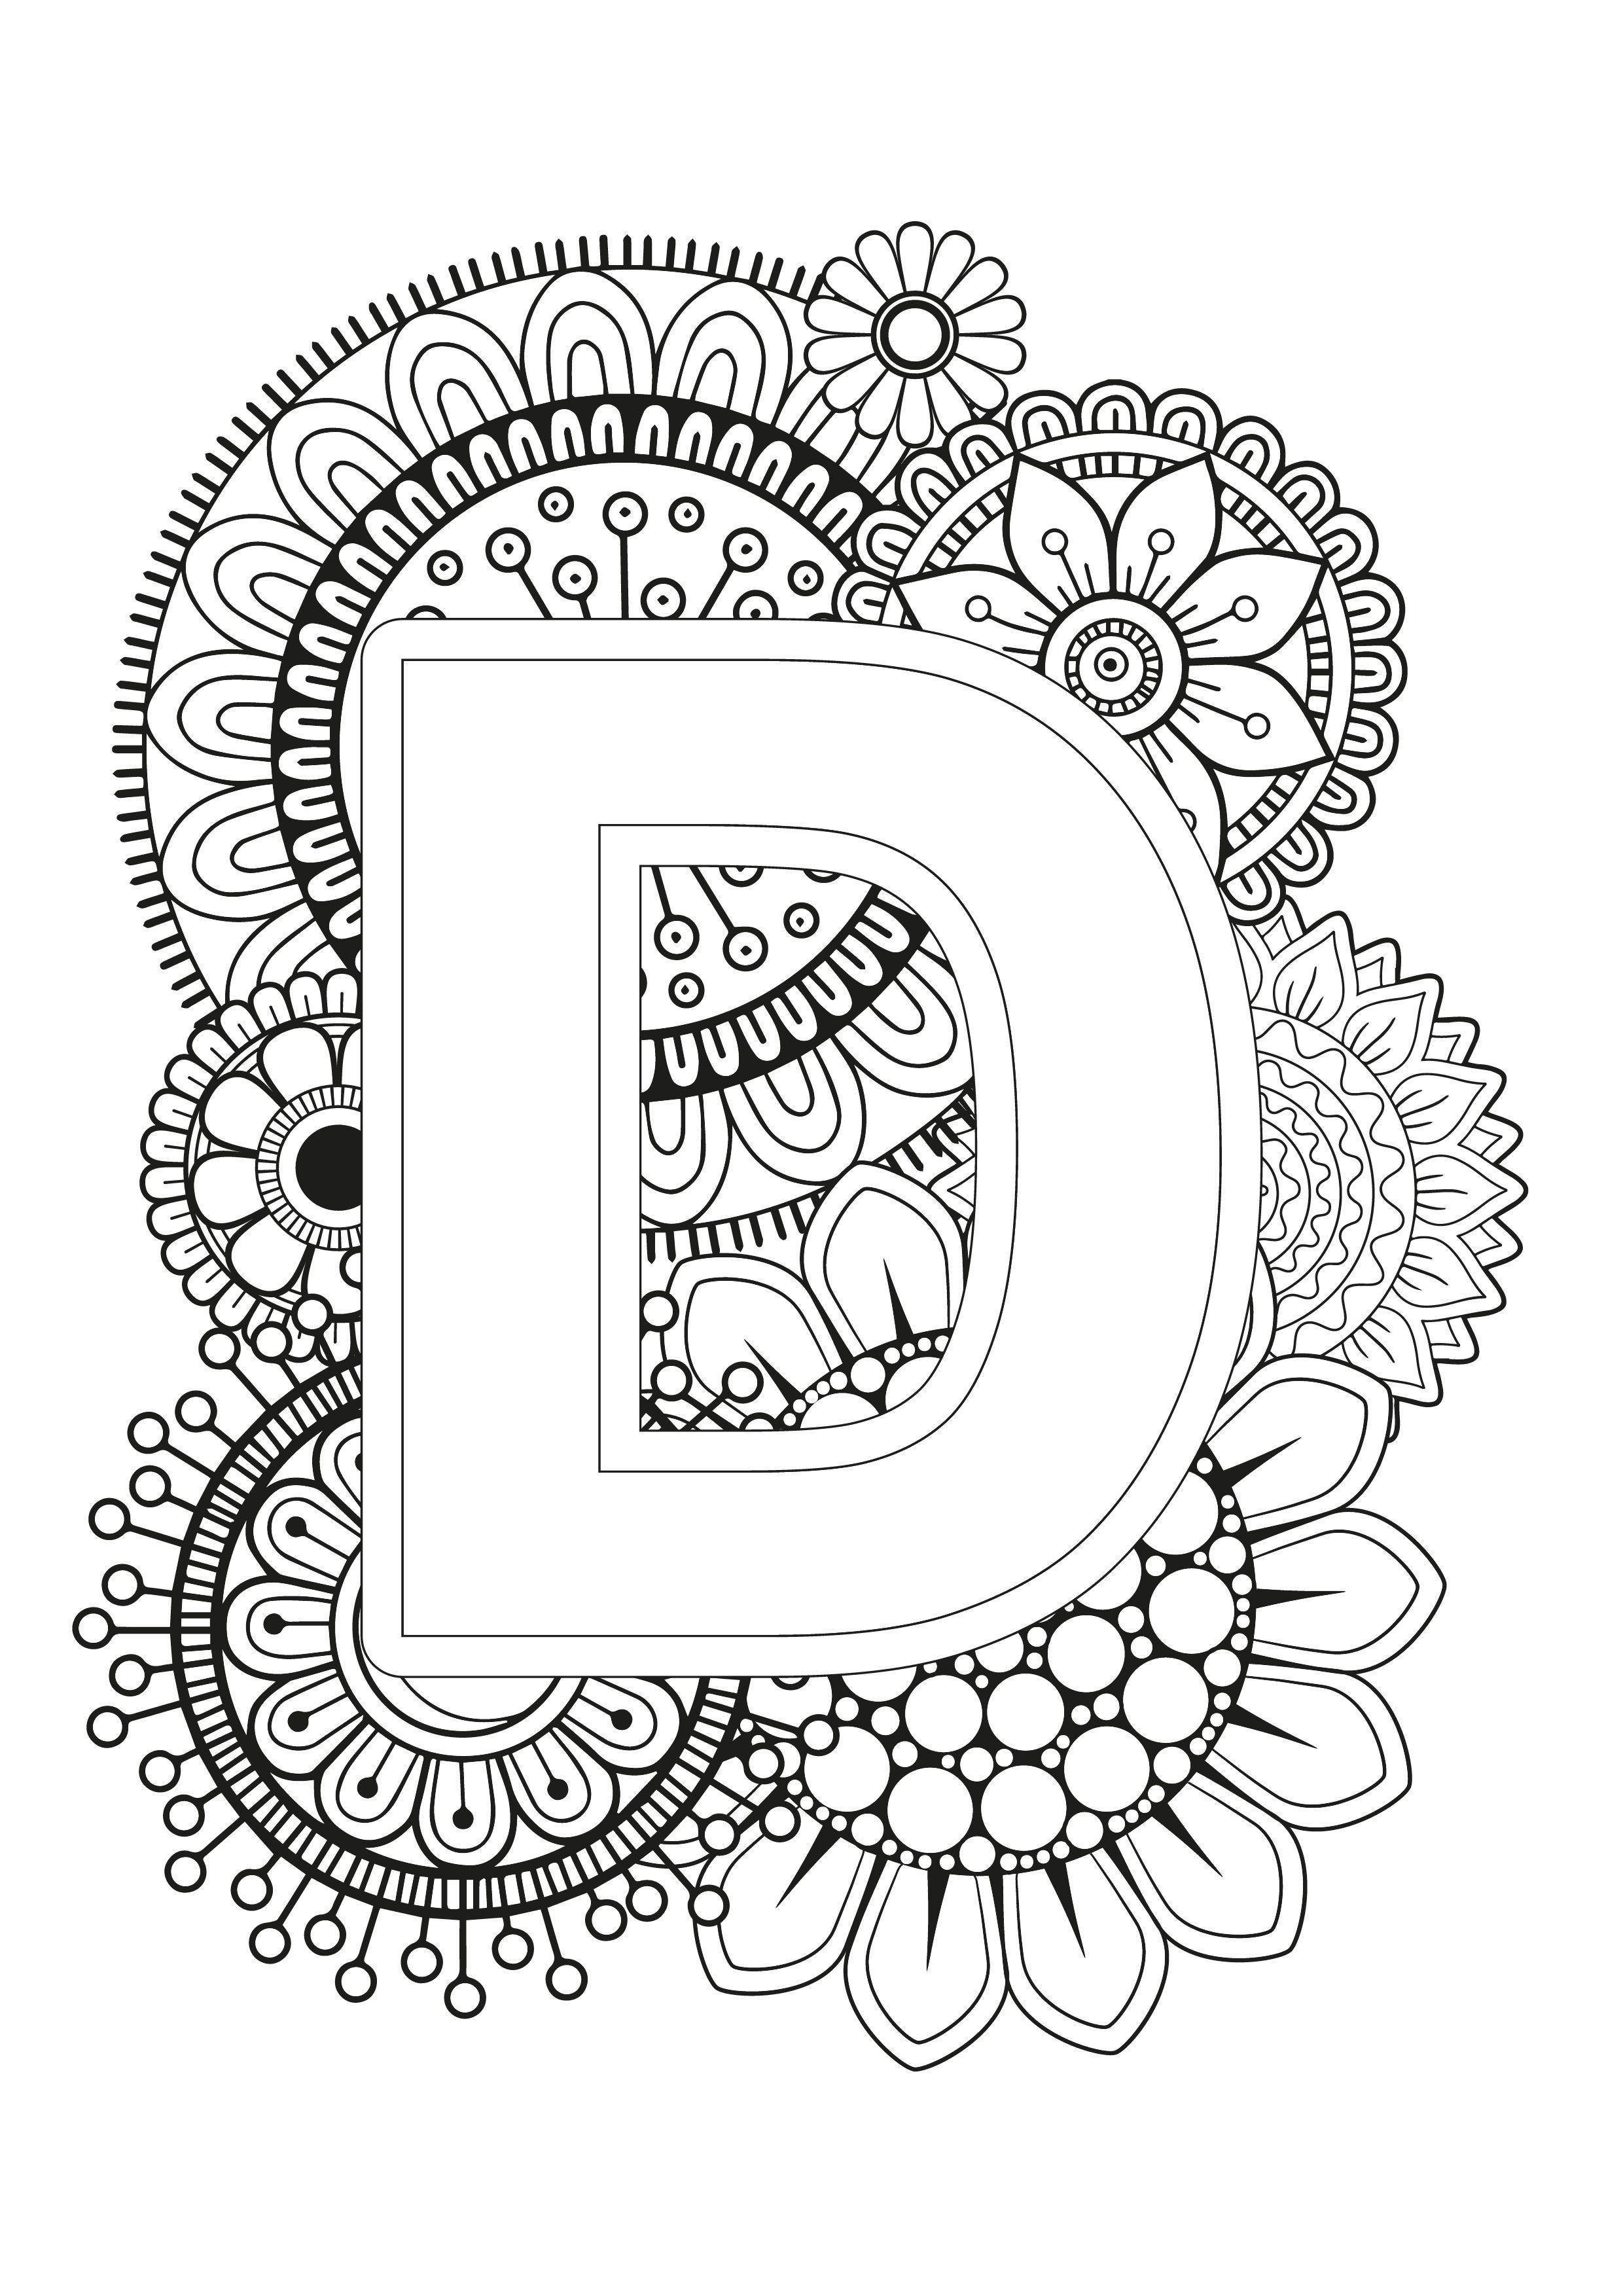 Mindfulness Coloring Page Alphabet Mandala Coloring Pages Alphabet Coloring Pages Mandala Coloring